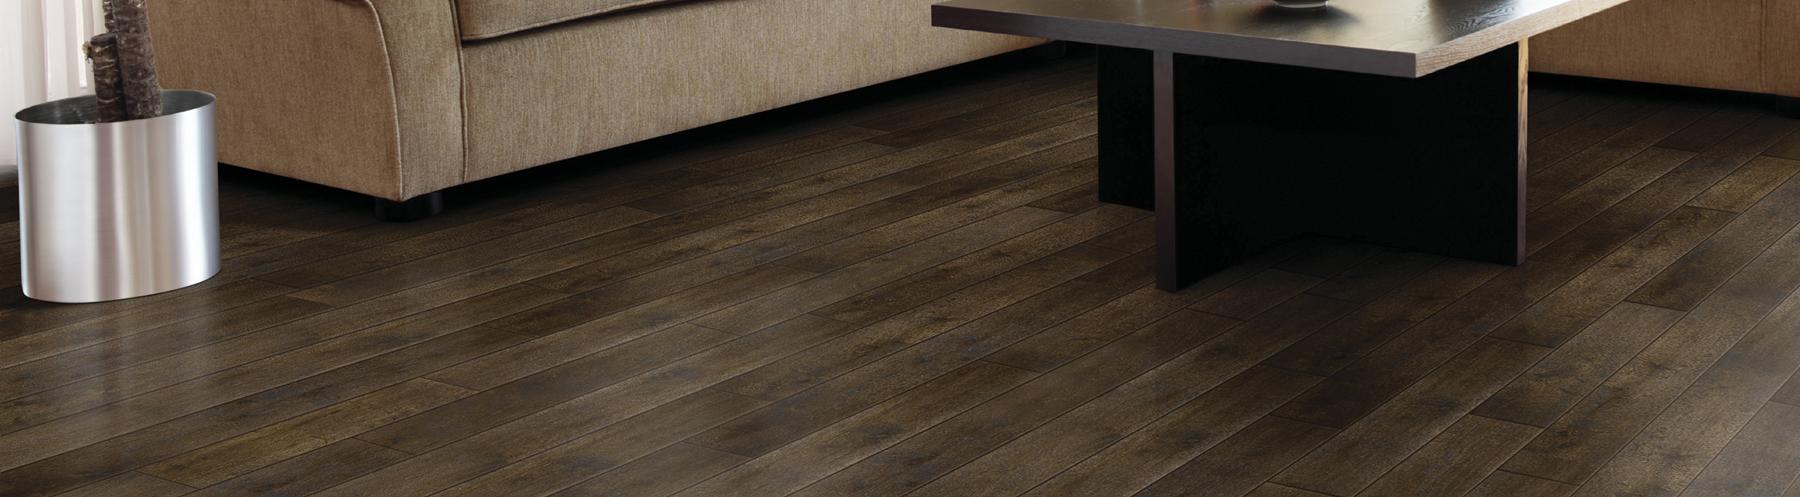 Wood flooring liquidation montreal floor matttroy for Hardwood floors montreal